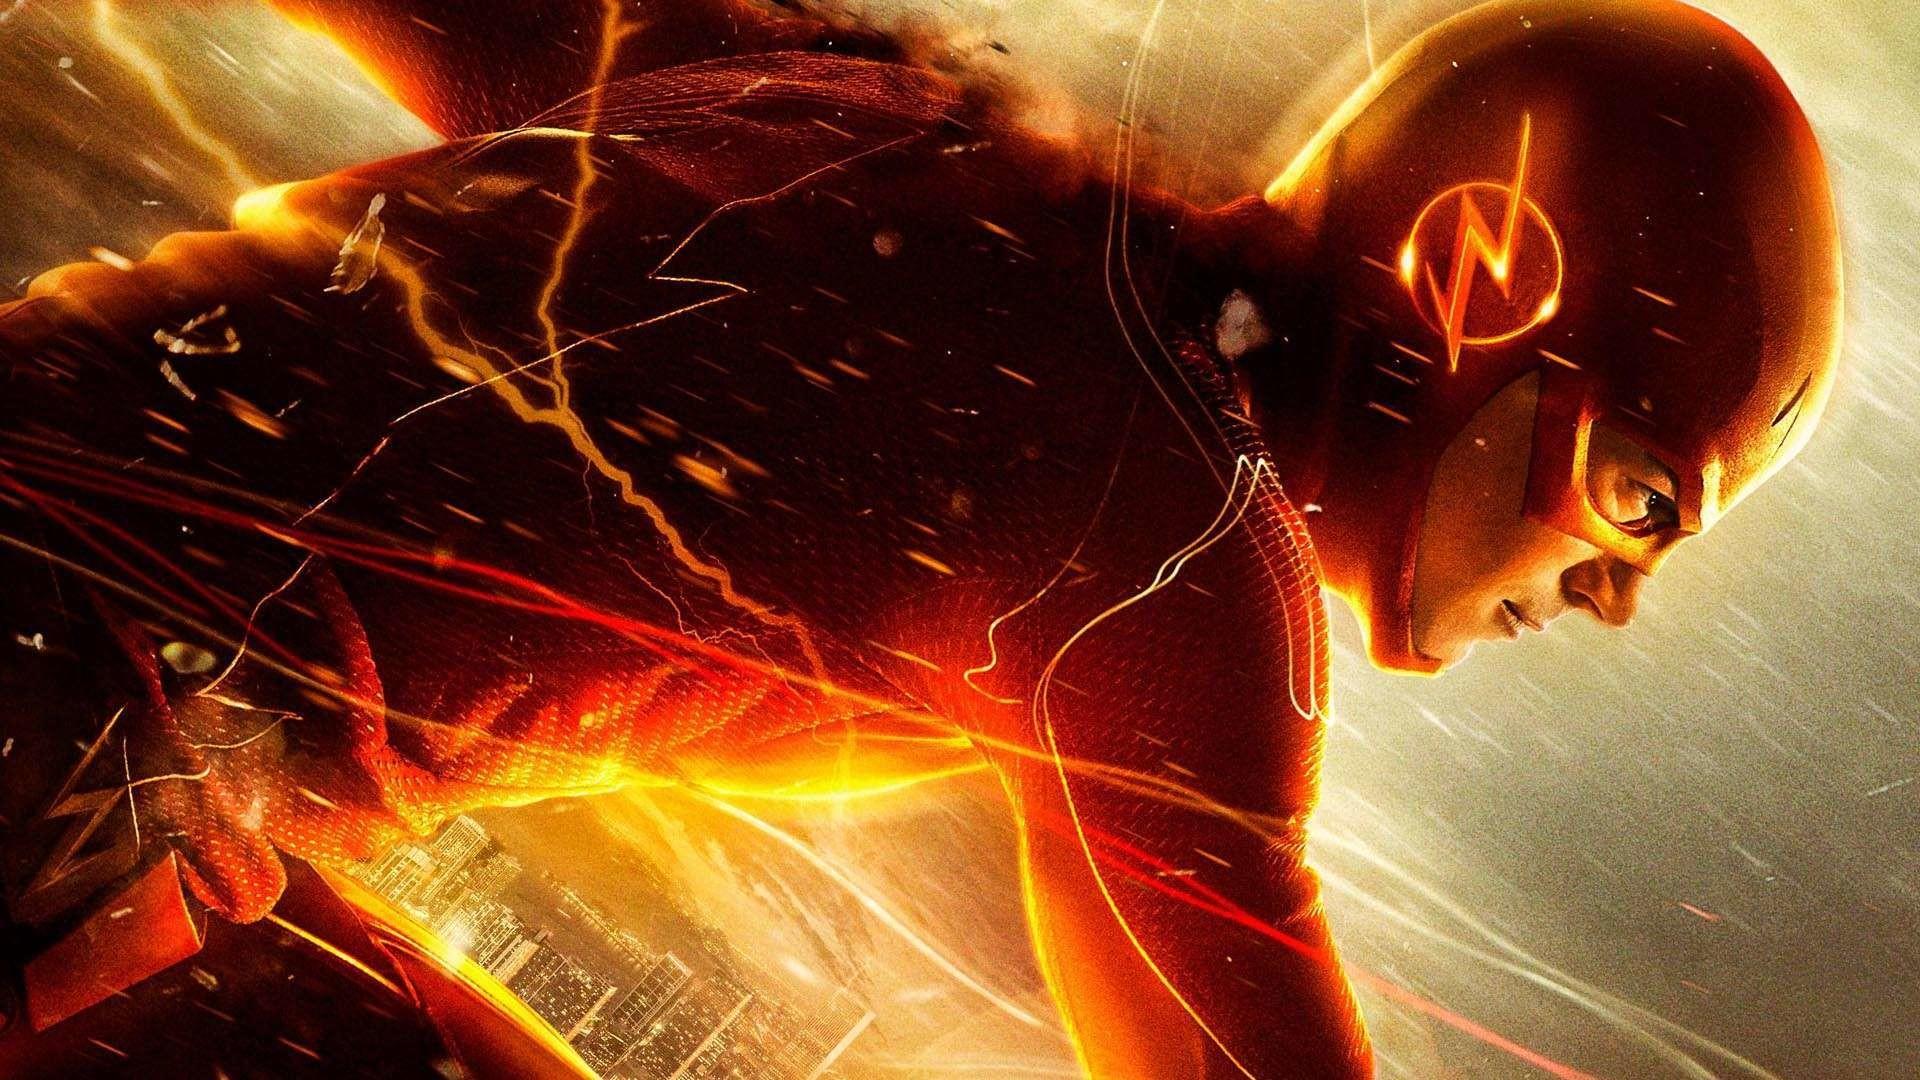 Barry Allen as The Flash Wallpaper free desktop backgrounds